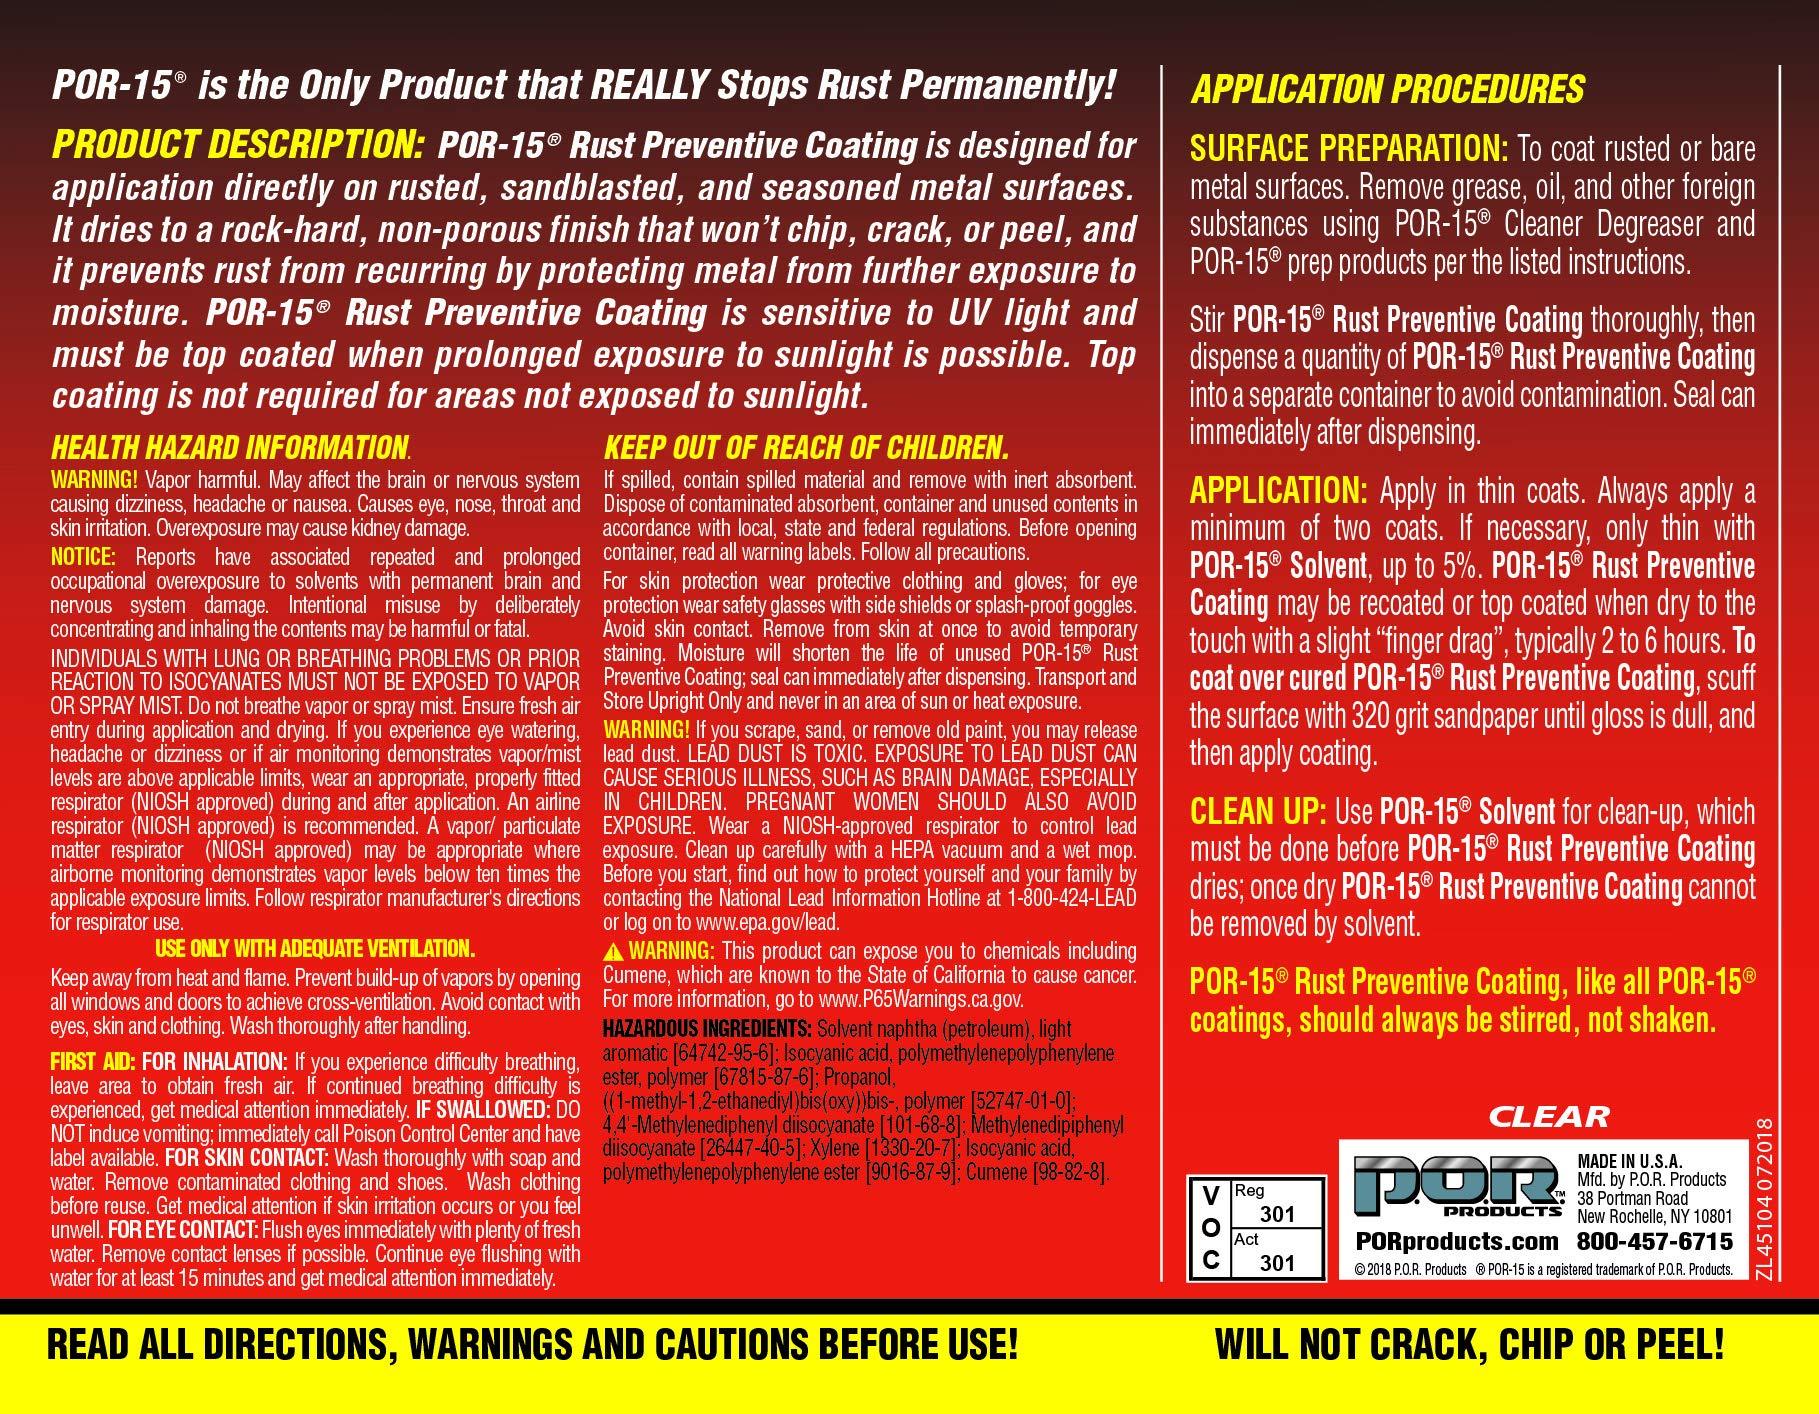 POR-15 45104 Clear Rust Preventive Coating - 1 quart by POR-15 (Image #3)